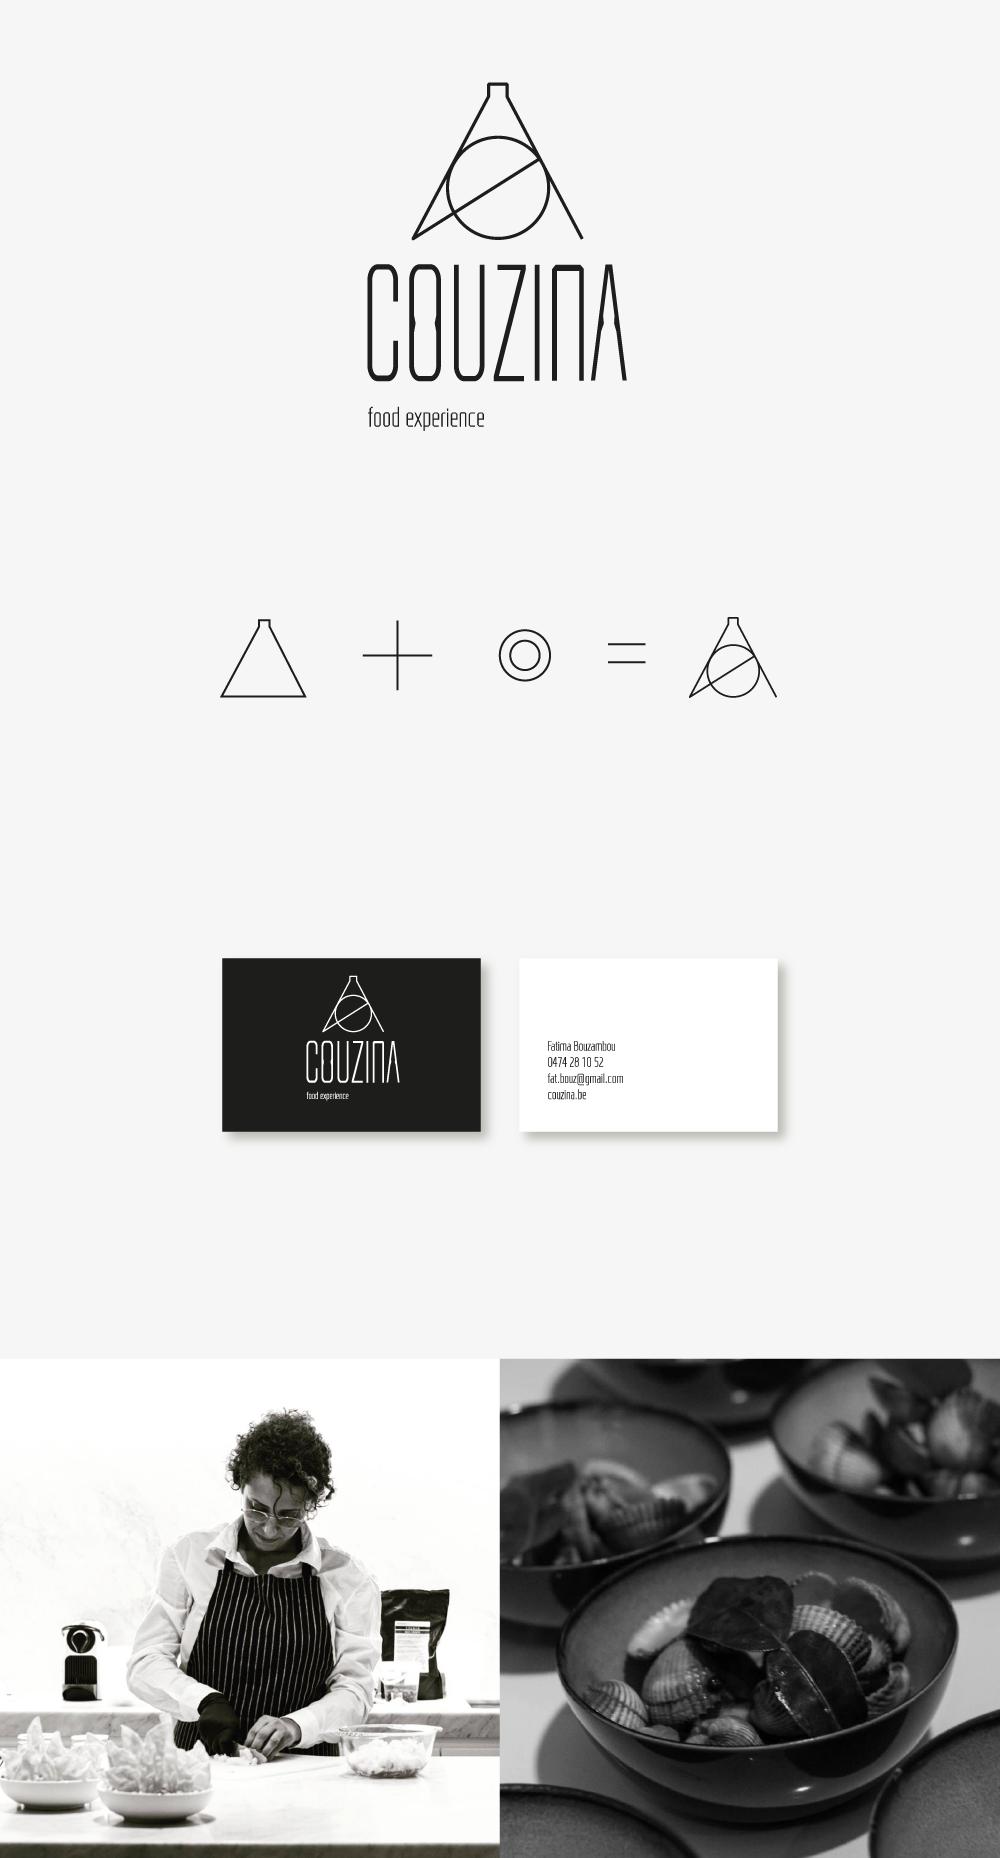 logo ontwerp voor Couzina - Portfolio Studejo